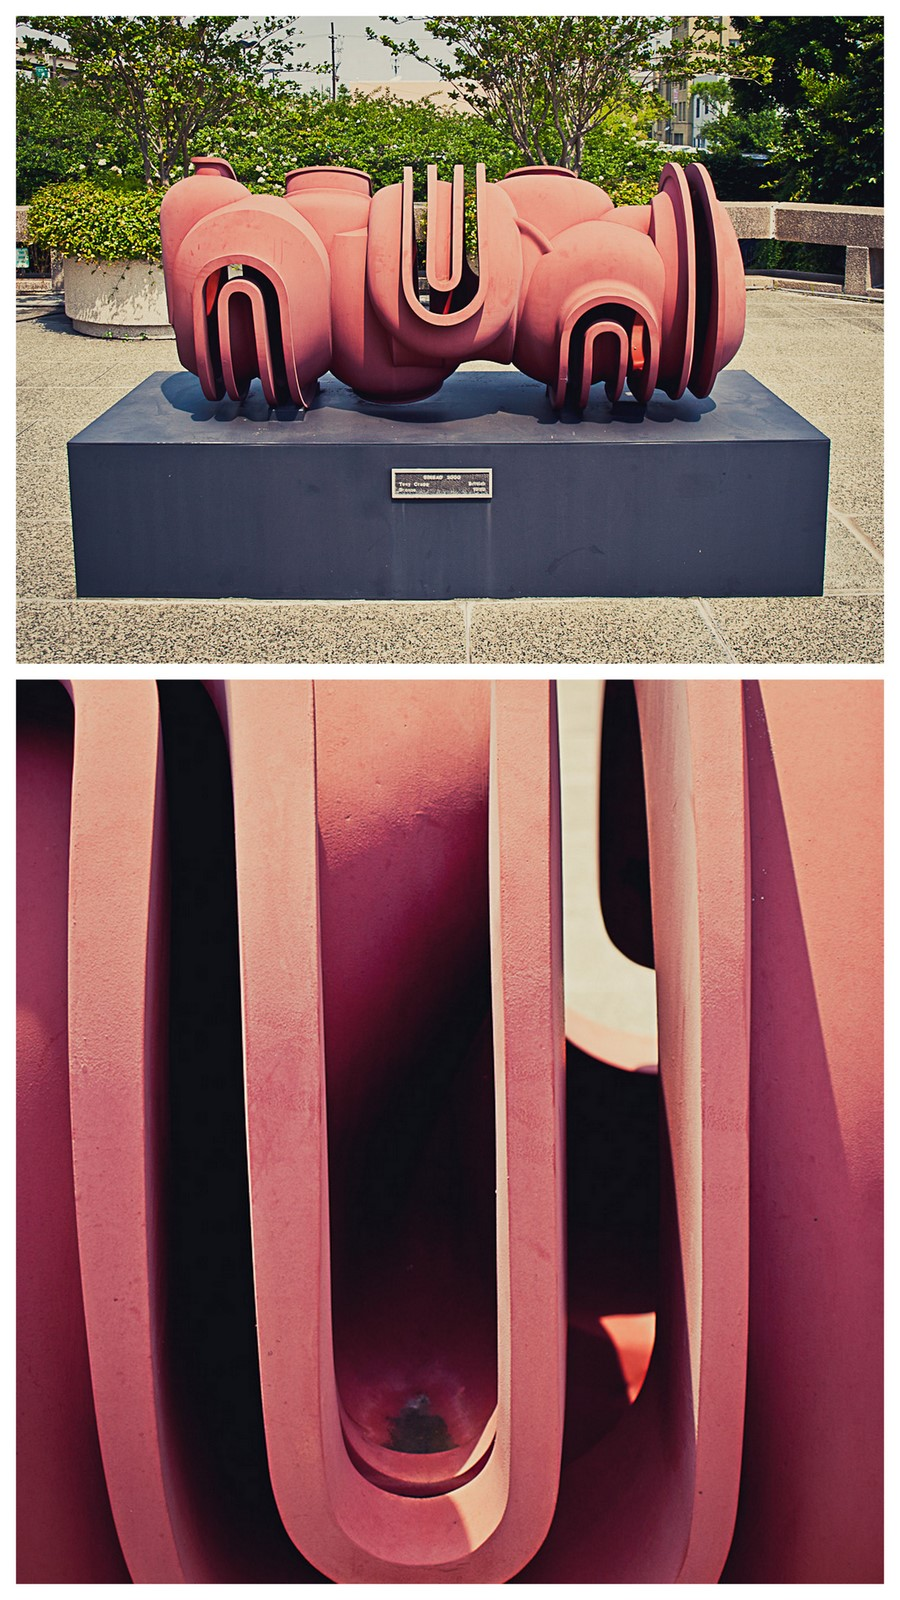 Public Sculpture5.jpg